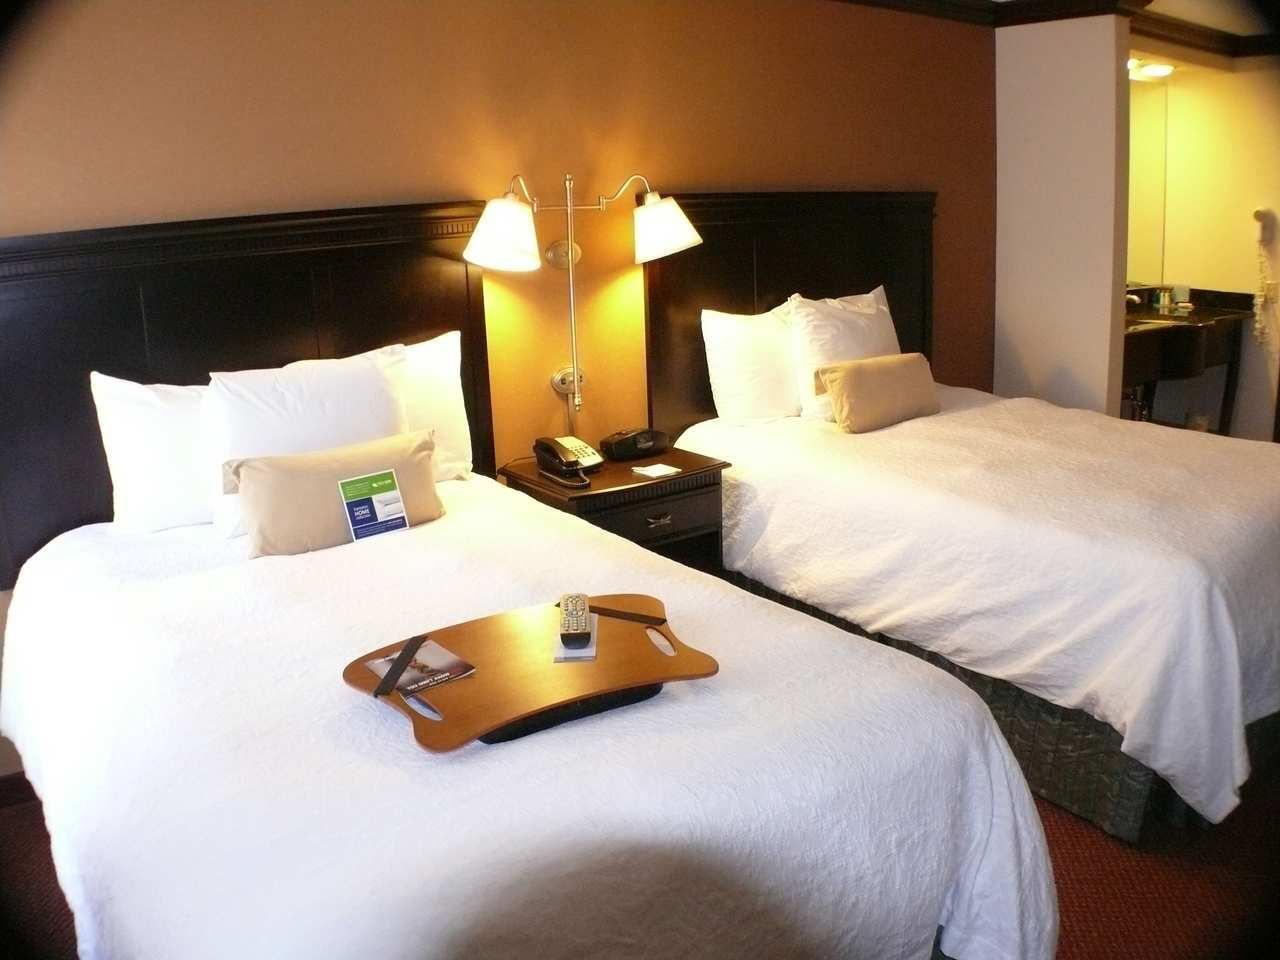 Hampton Inn & Suites Chicago/Hoffman Estates image 13